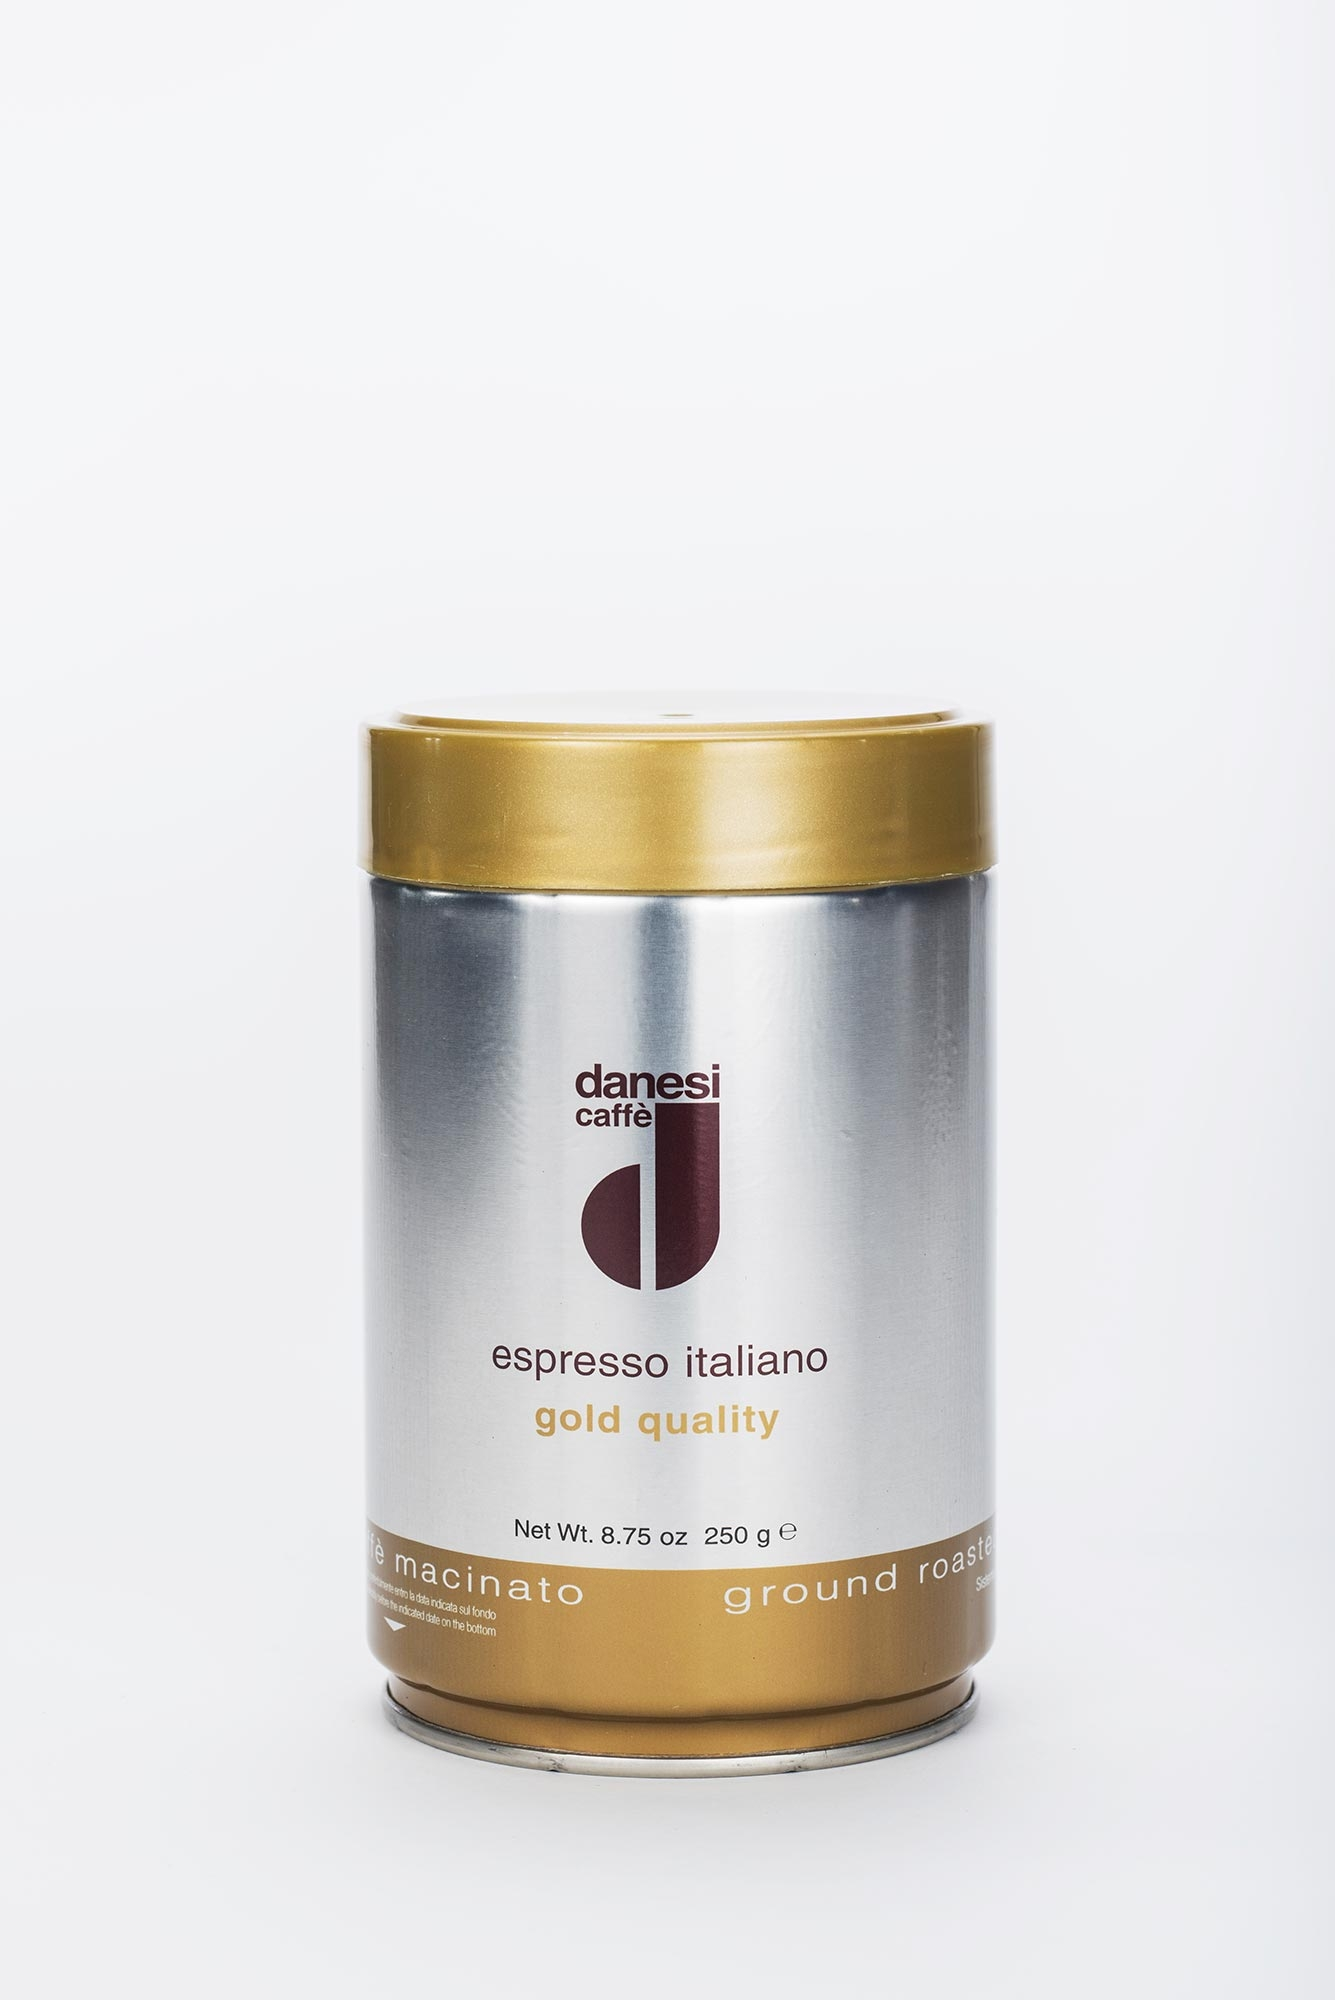 danesi caff espresso oro 250g dose gemahlene bohnen online kaufen roastmarket. Black Bedroom Furniture Sets. Home Design Ideas